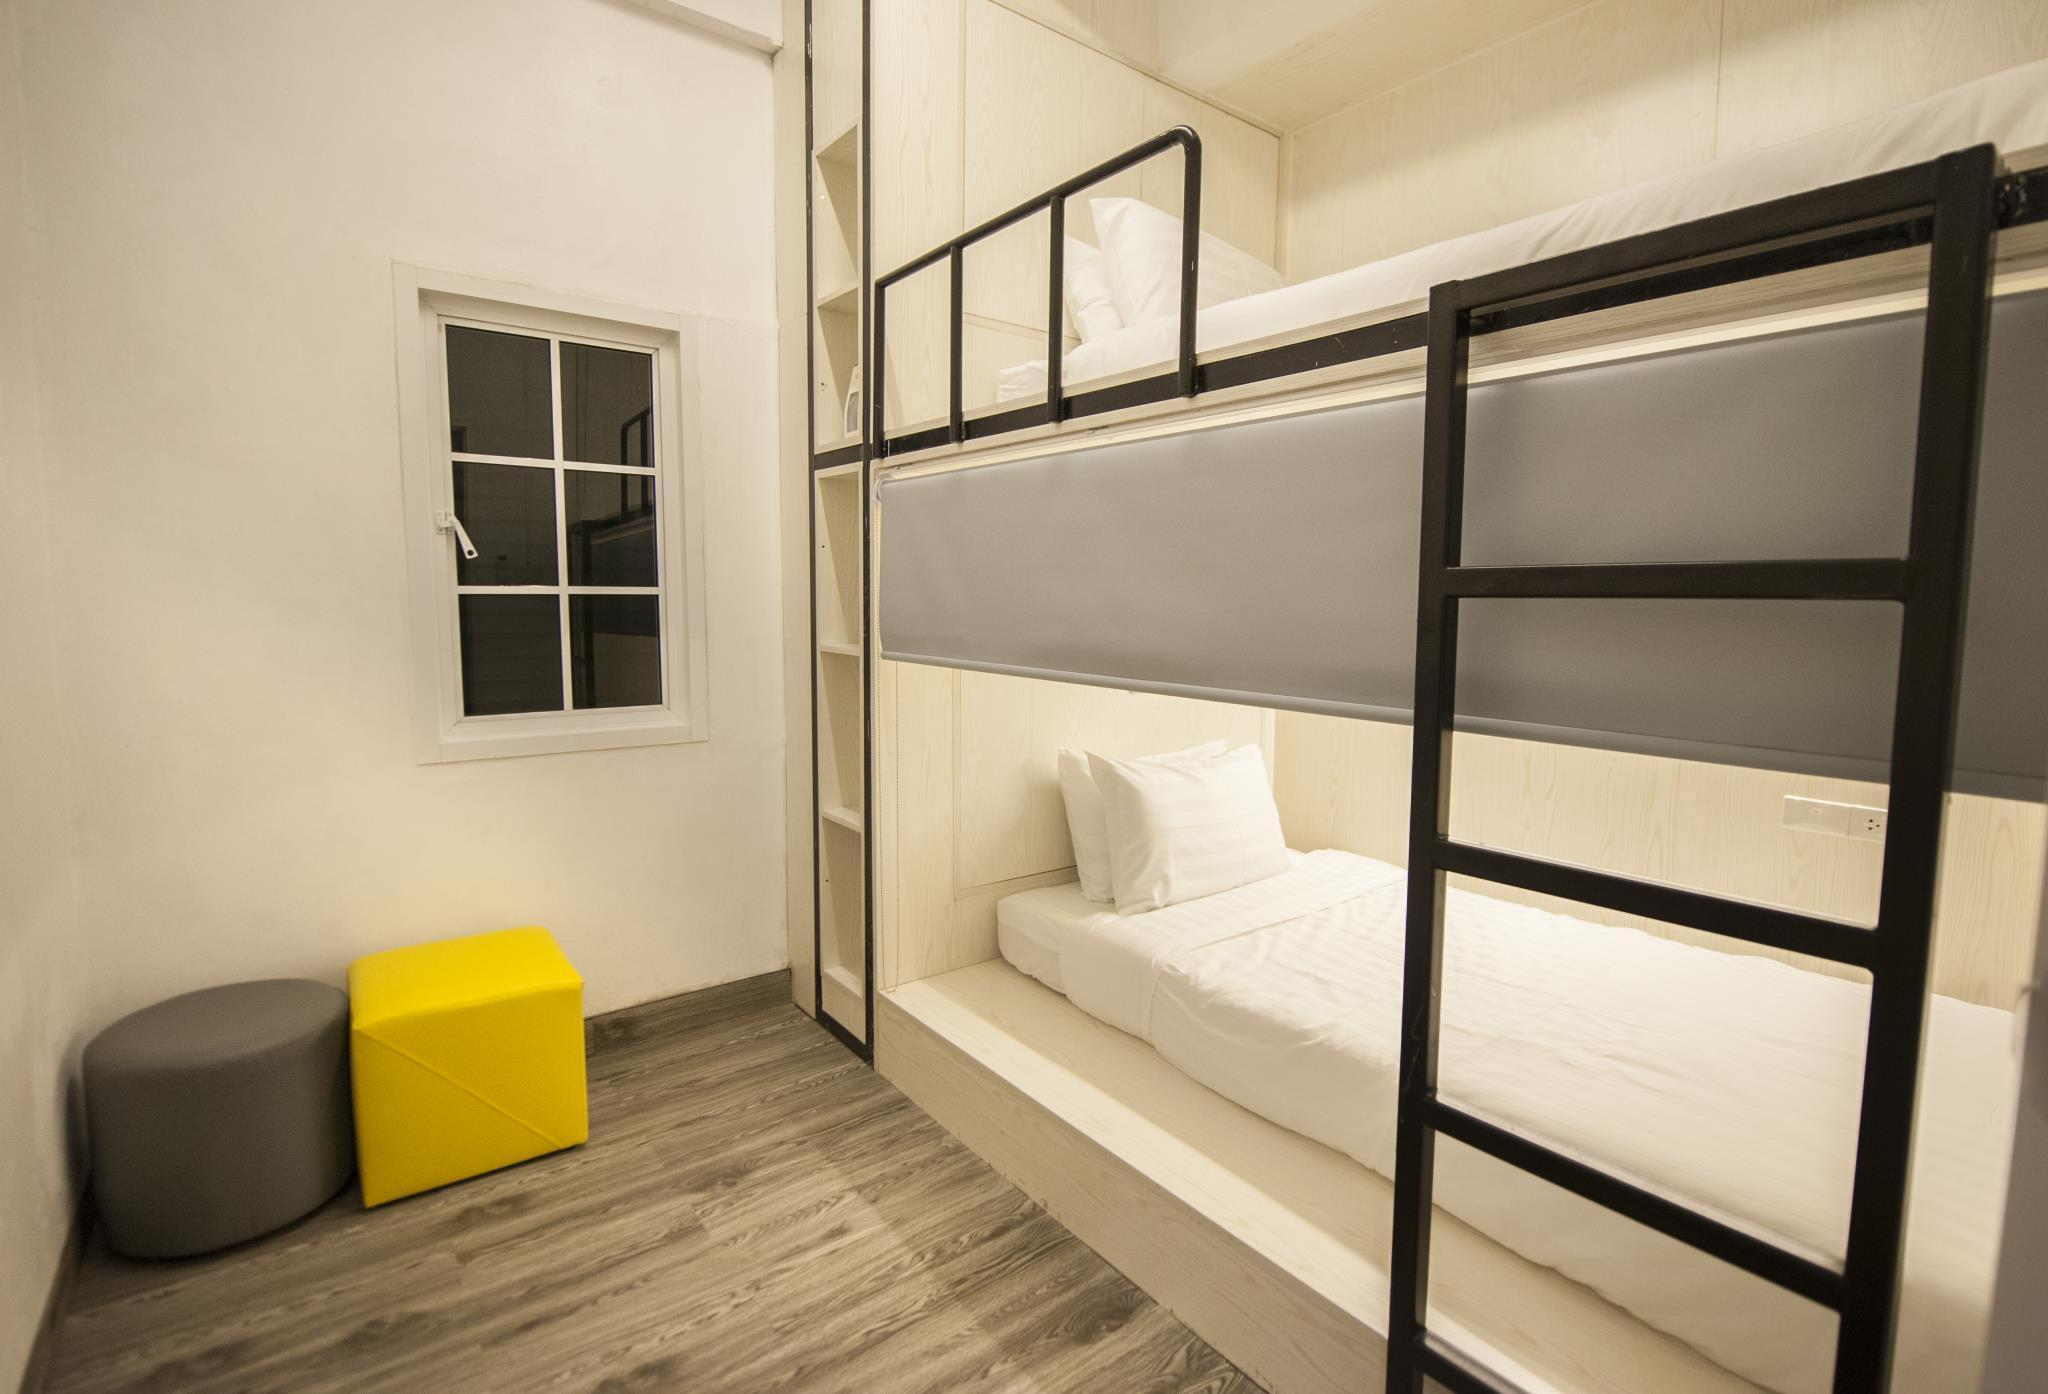 S7 Hostel, Wattana